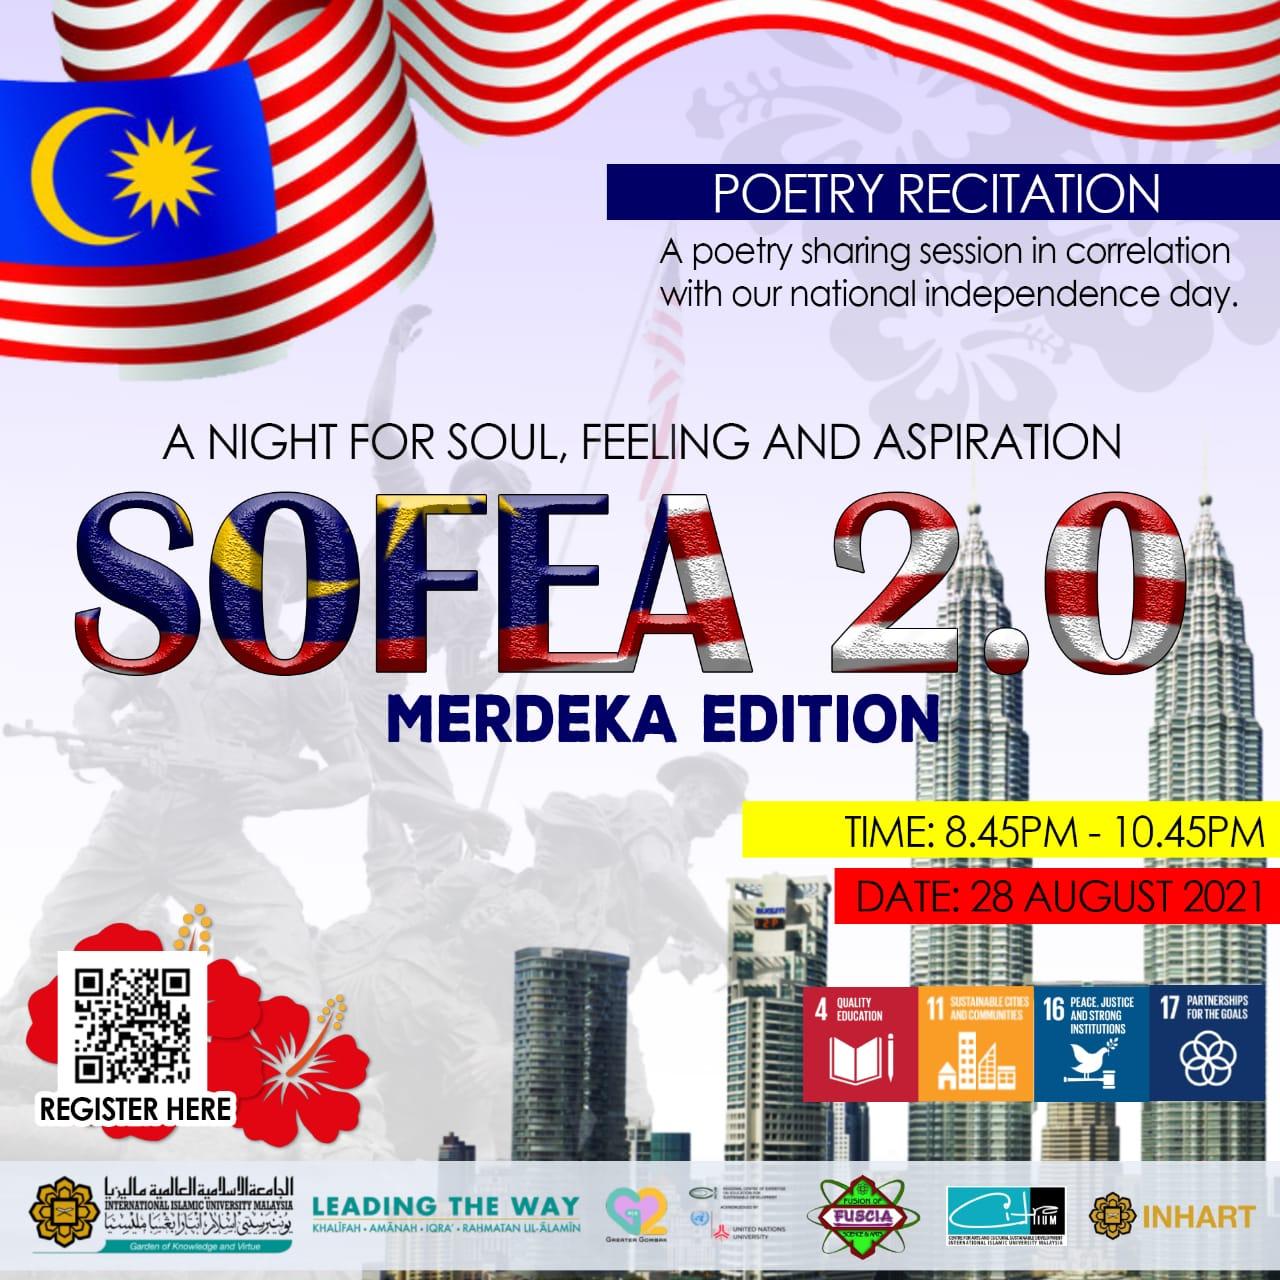 A Night for SOFEA (Soul, Feeling and Aspiration) 2.0: Merdeka Edition